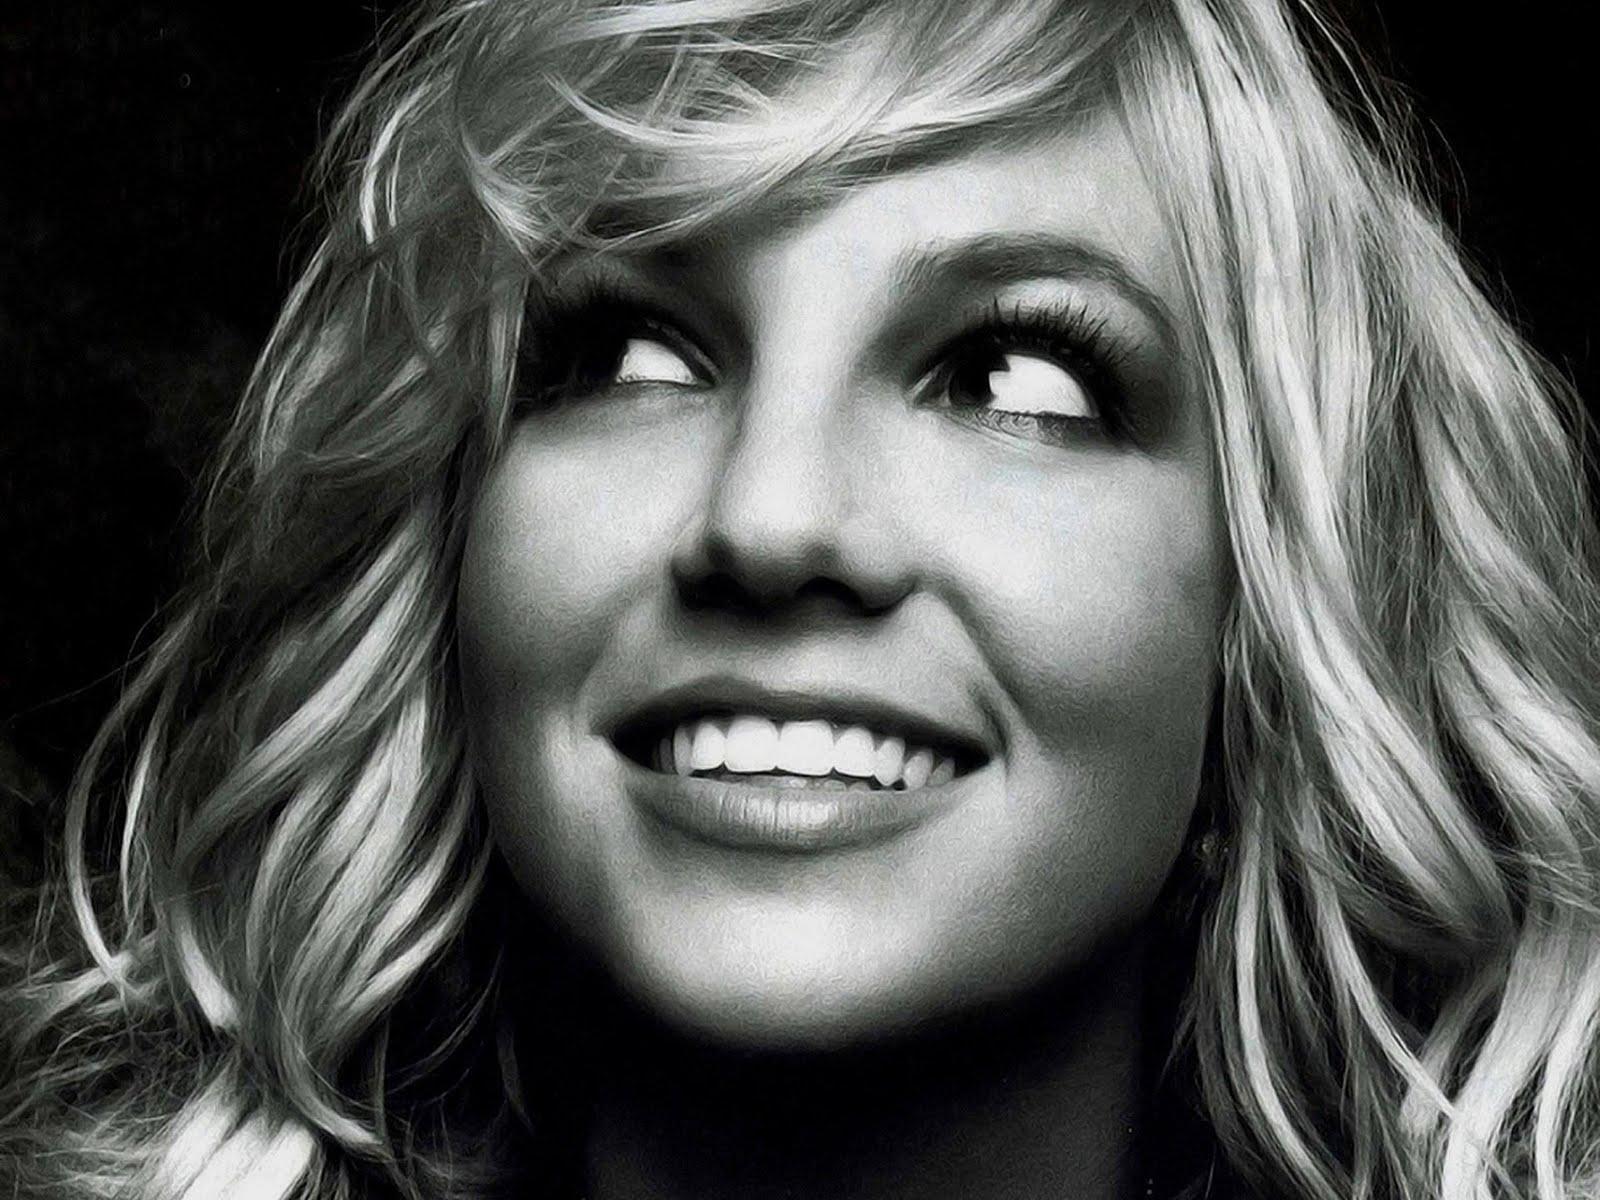 Mobile Wallpapers Britney Spears Wallpaper